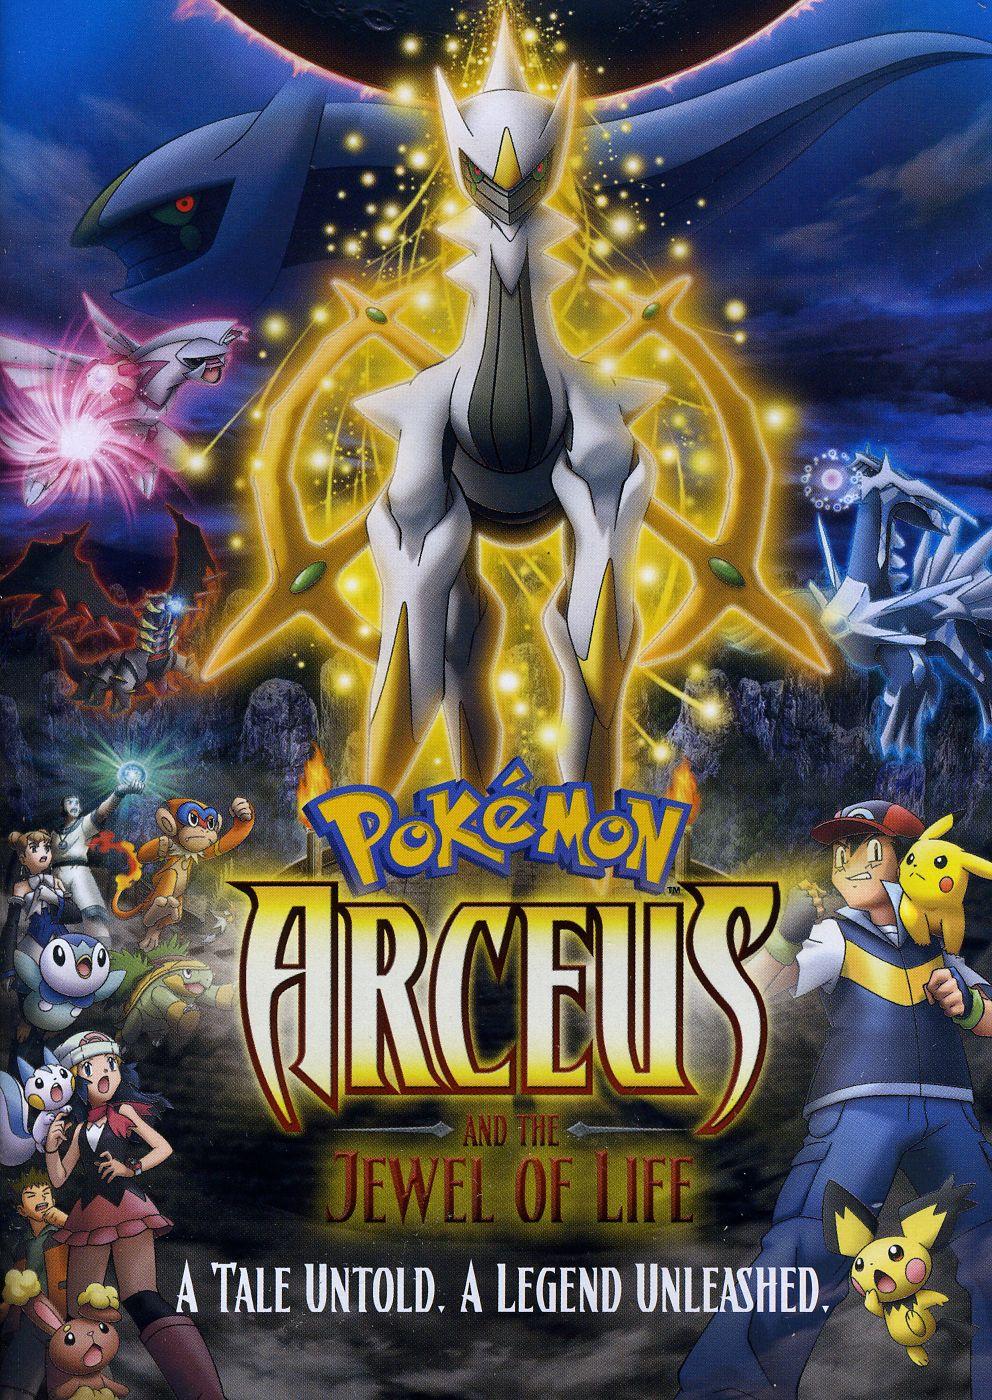 Pokemon: Arceus and the Jewel of Life (DVD)